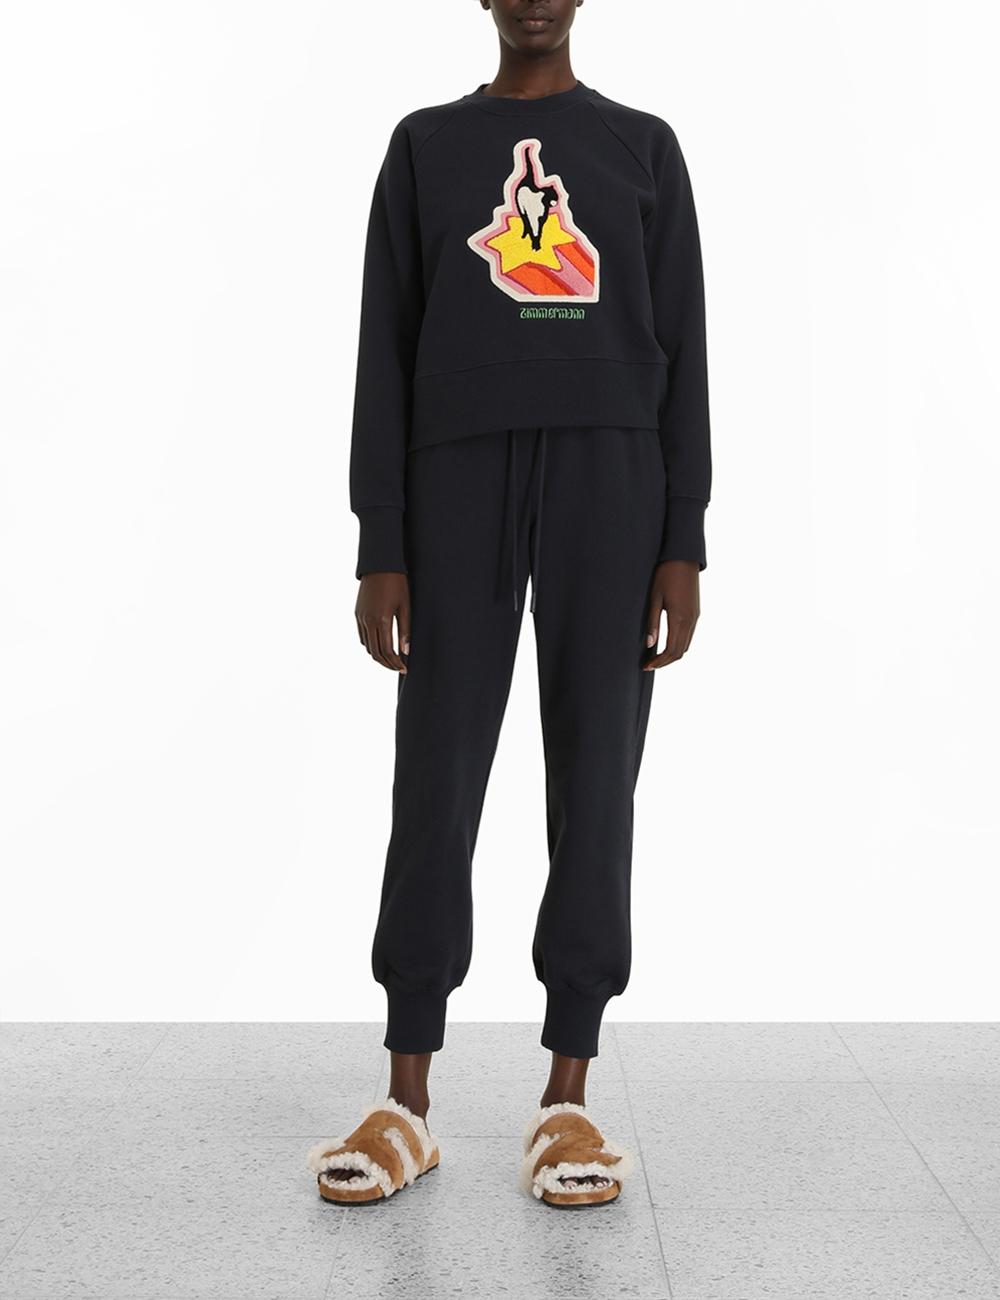 Starcat Embroidered Sweatshirt